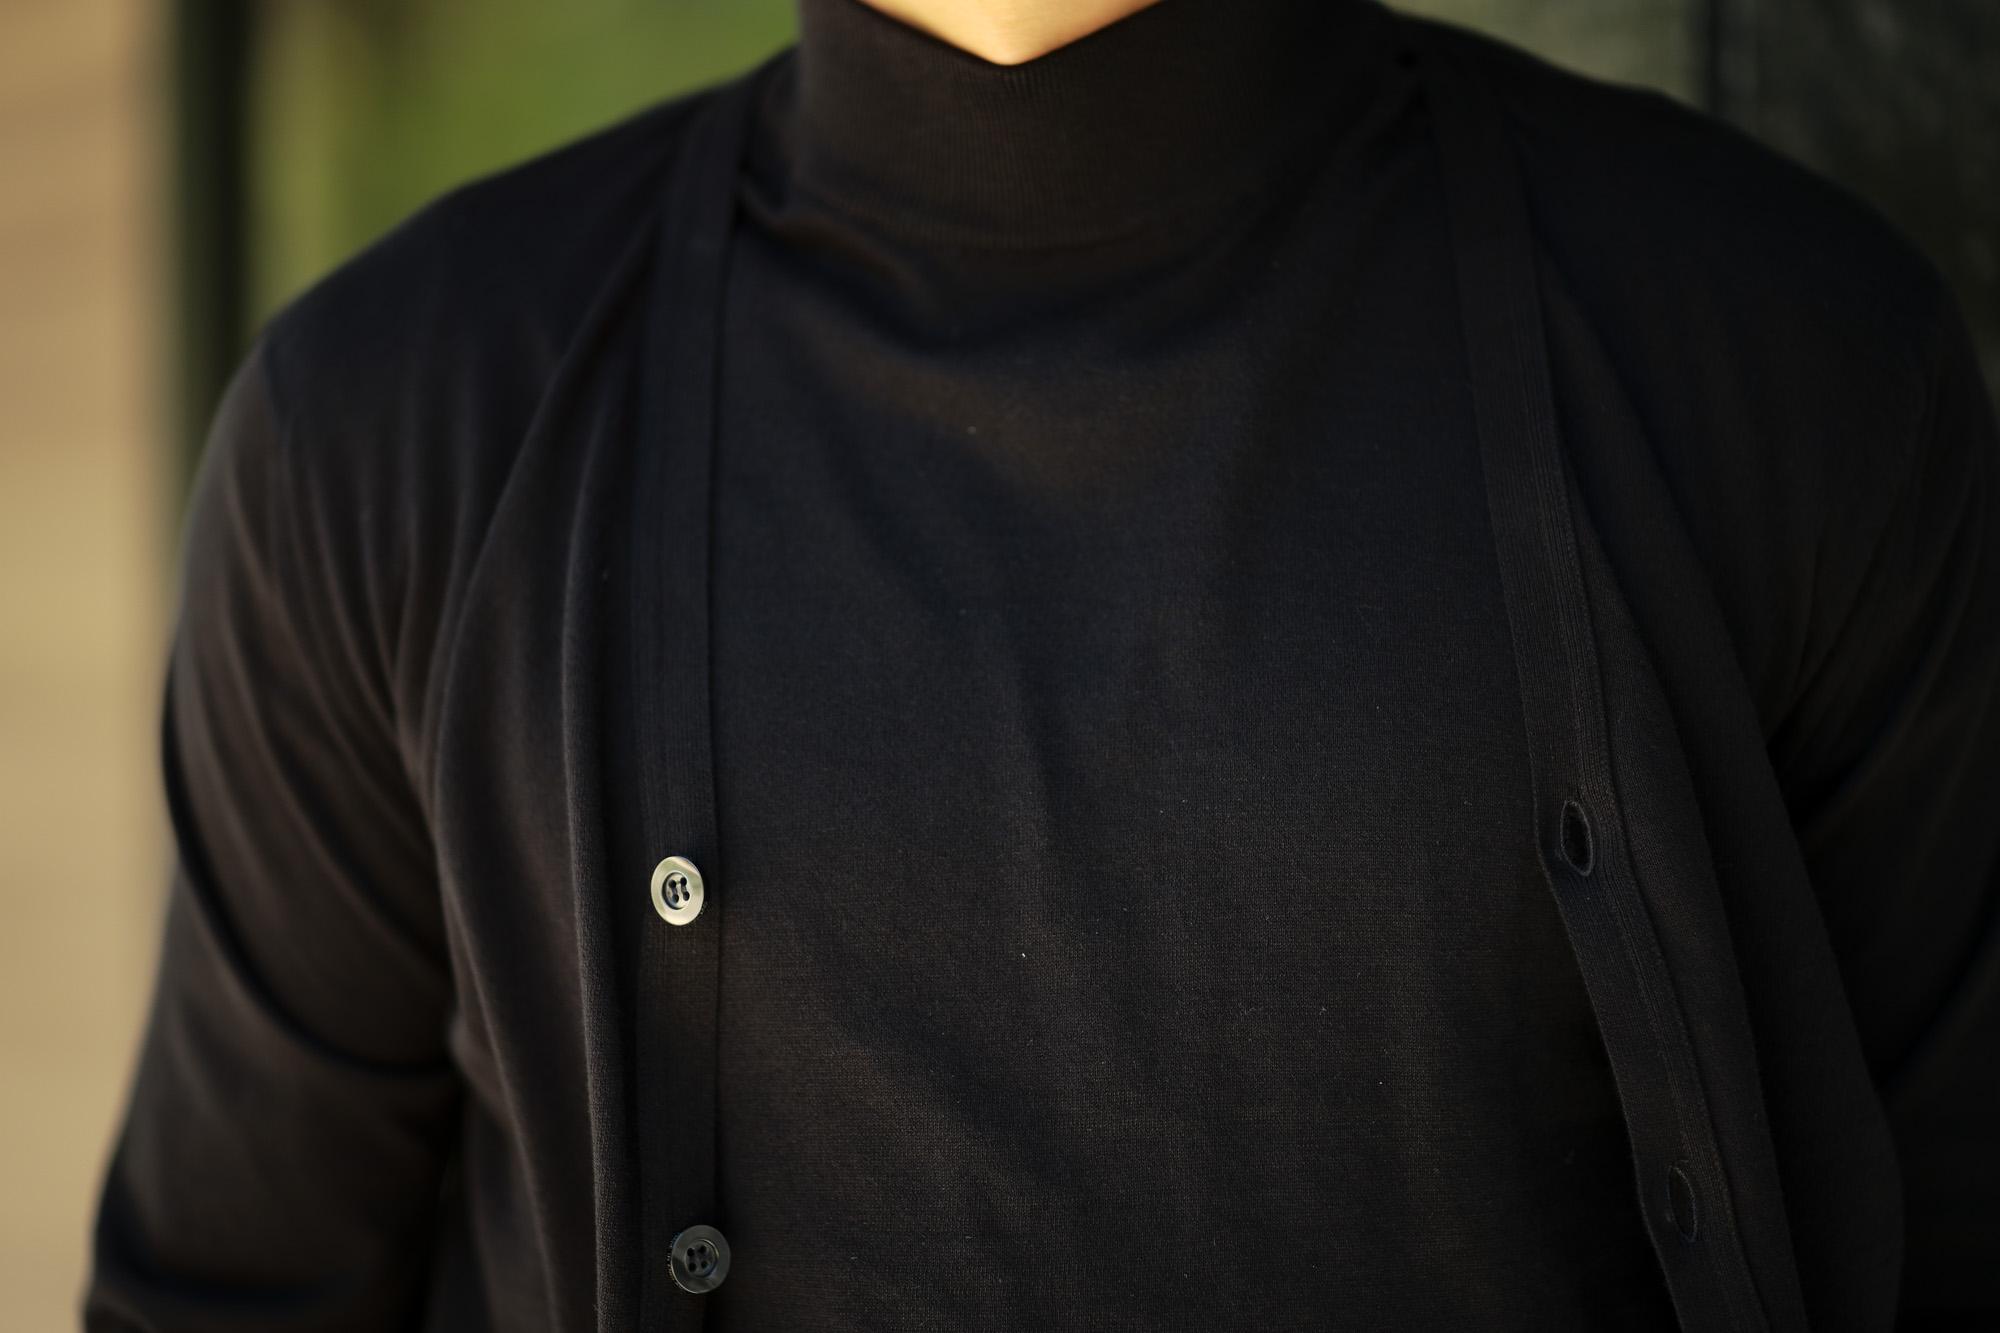 JOHN SMEDLEY (ジョンスメドレー) ISEO (イセオ) SEA ISLAND COTTON (シーアイランドコットン) コットンニット Vネック カーディガン BLACK (ブラック) Made in England (イギリス製) 2019 春夏新作 johnsmedley 愛知 名古屋 altoediritto アルトエデリット